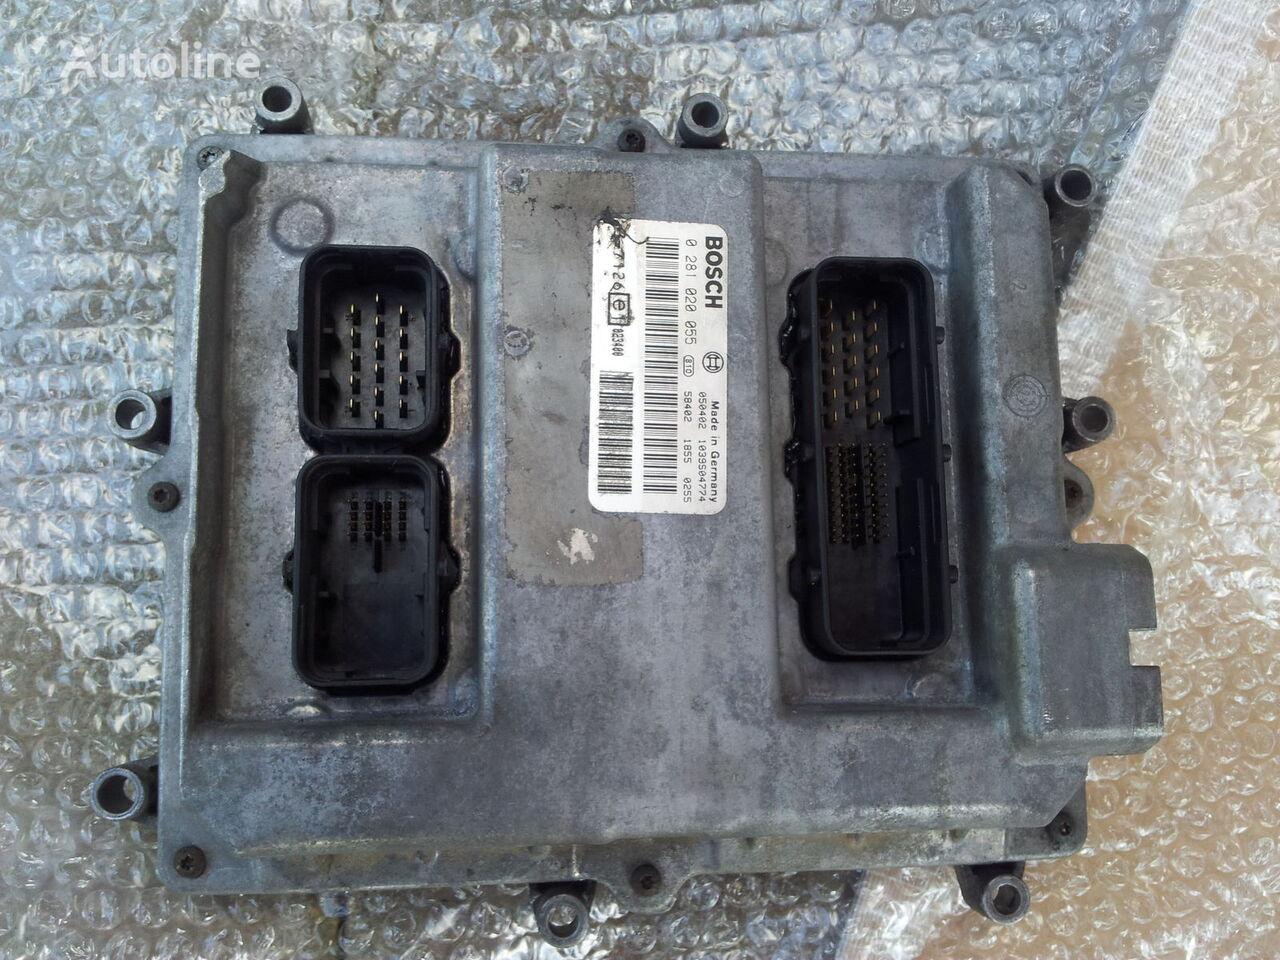 MAN Common Rail EDC, ECU electronic diesel control 0281020055, D2066LF01, 51258037126, 51258337169, 51258037127, 51258337168 control unit for MAN TGA tractor unit